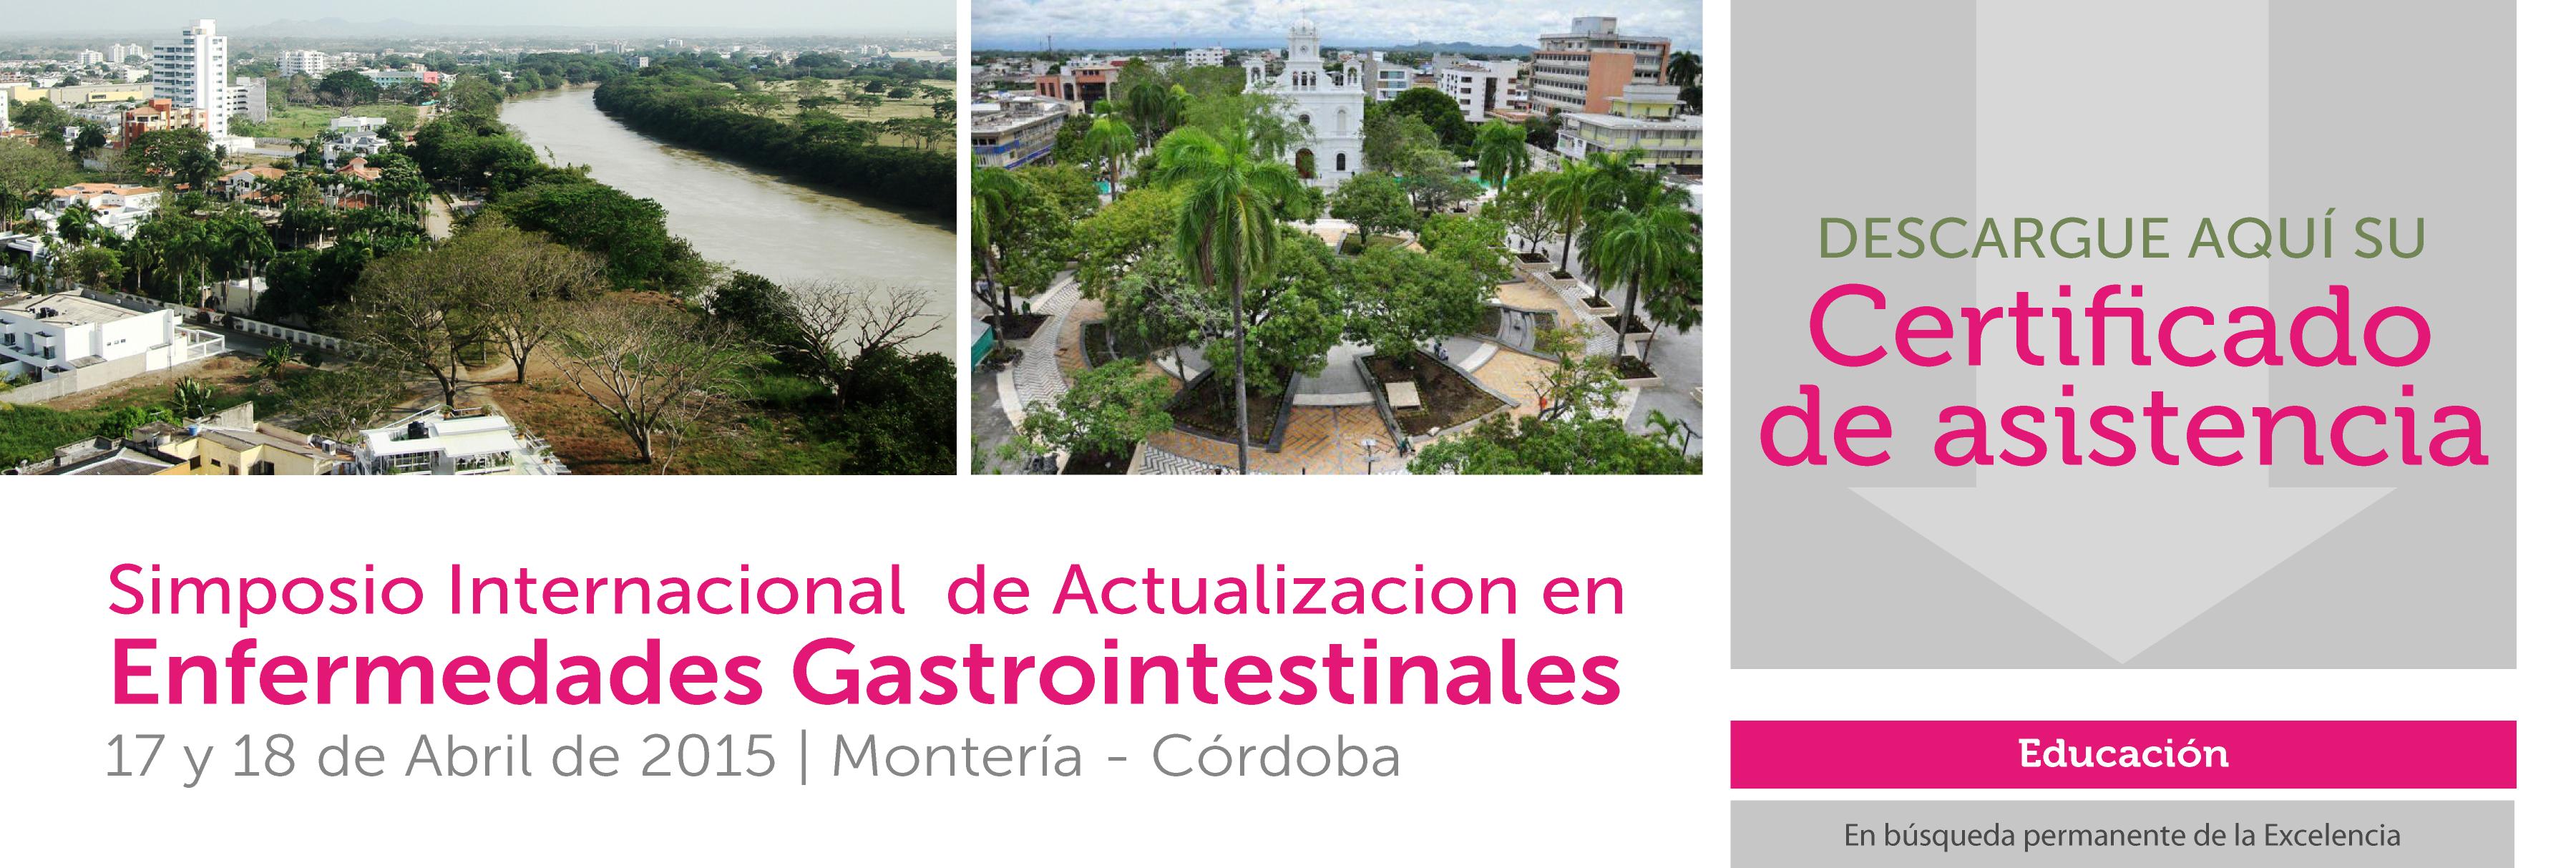 Monteria2015 certificados